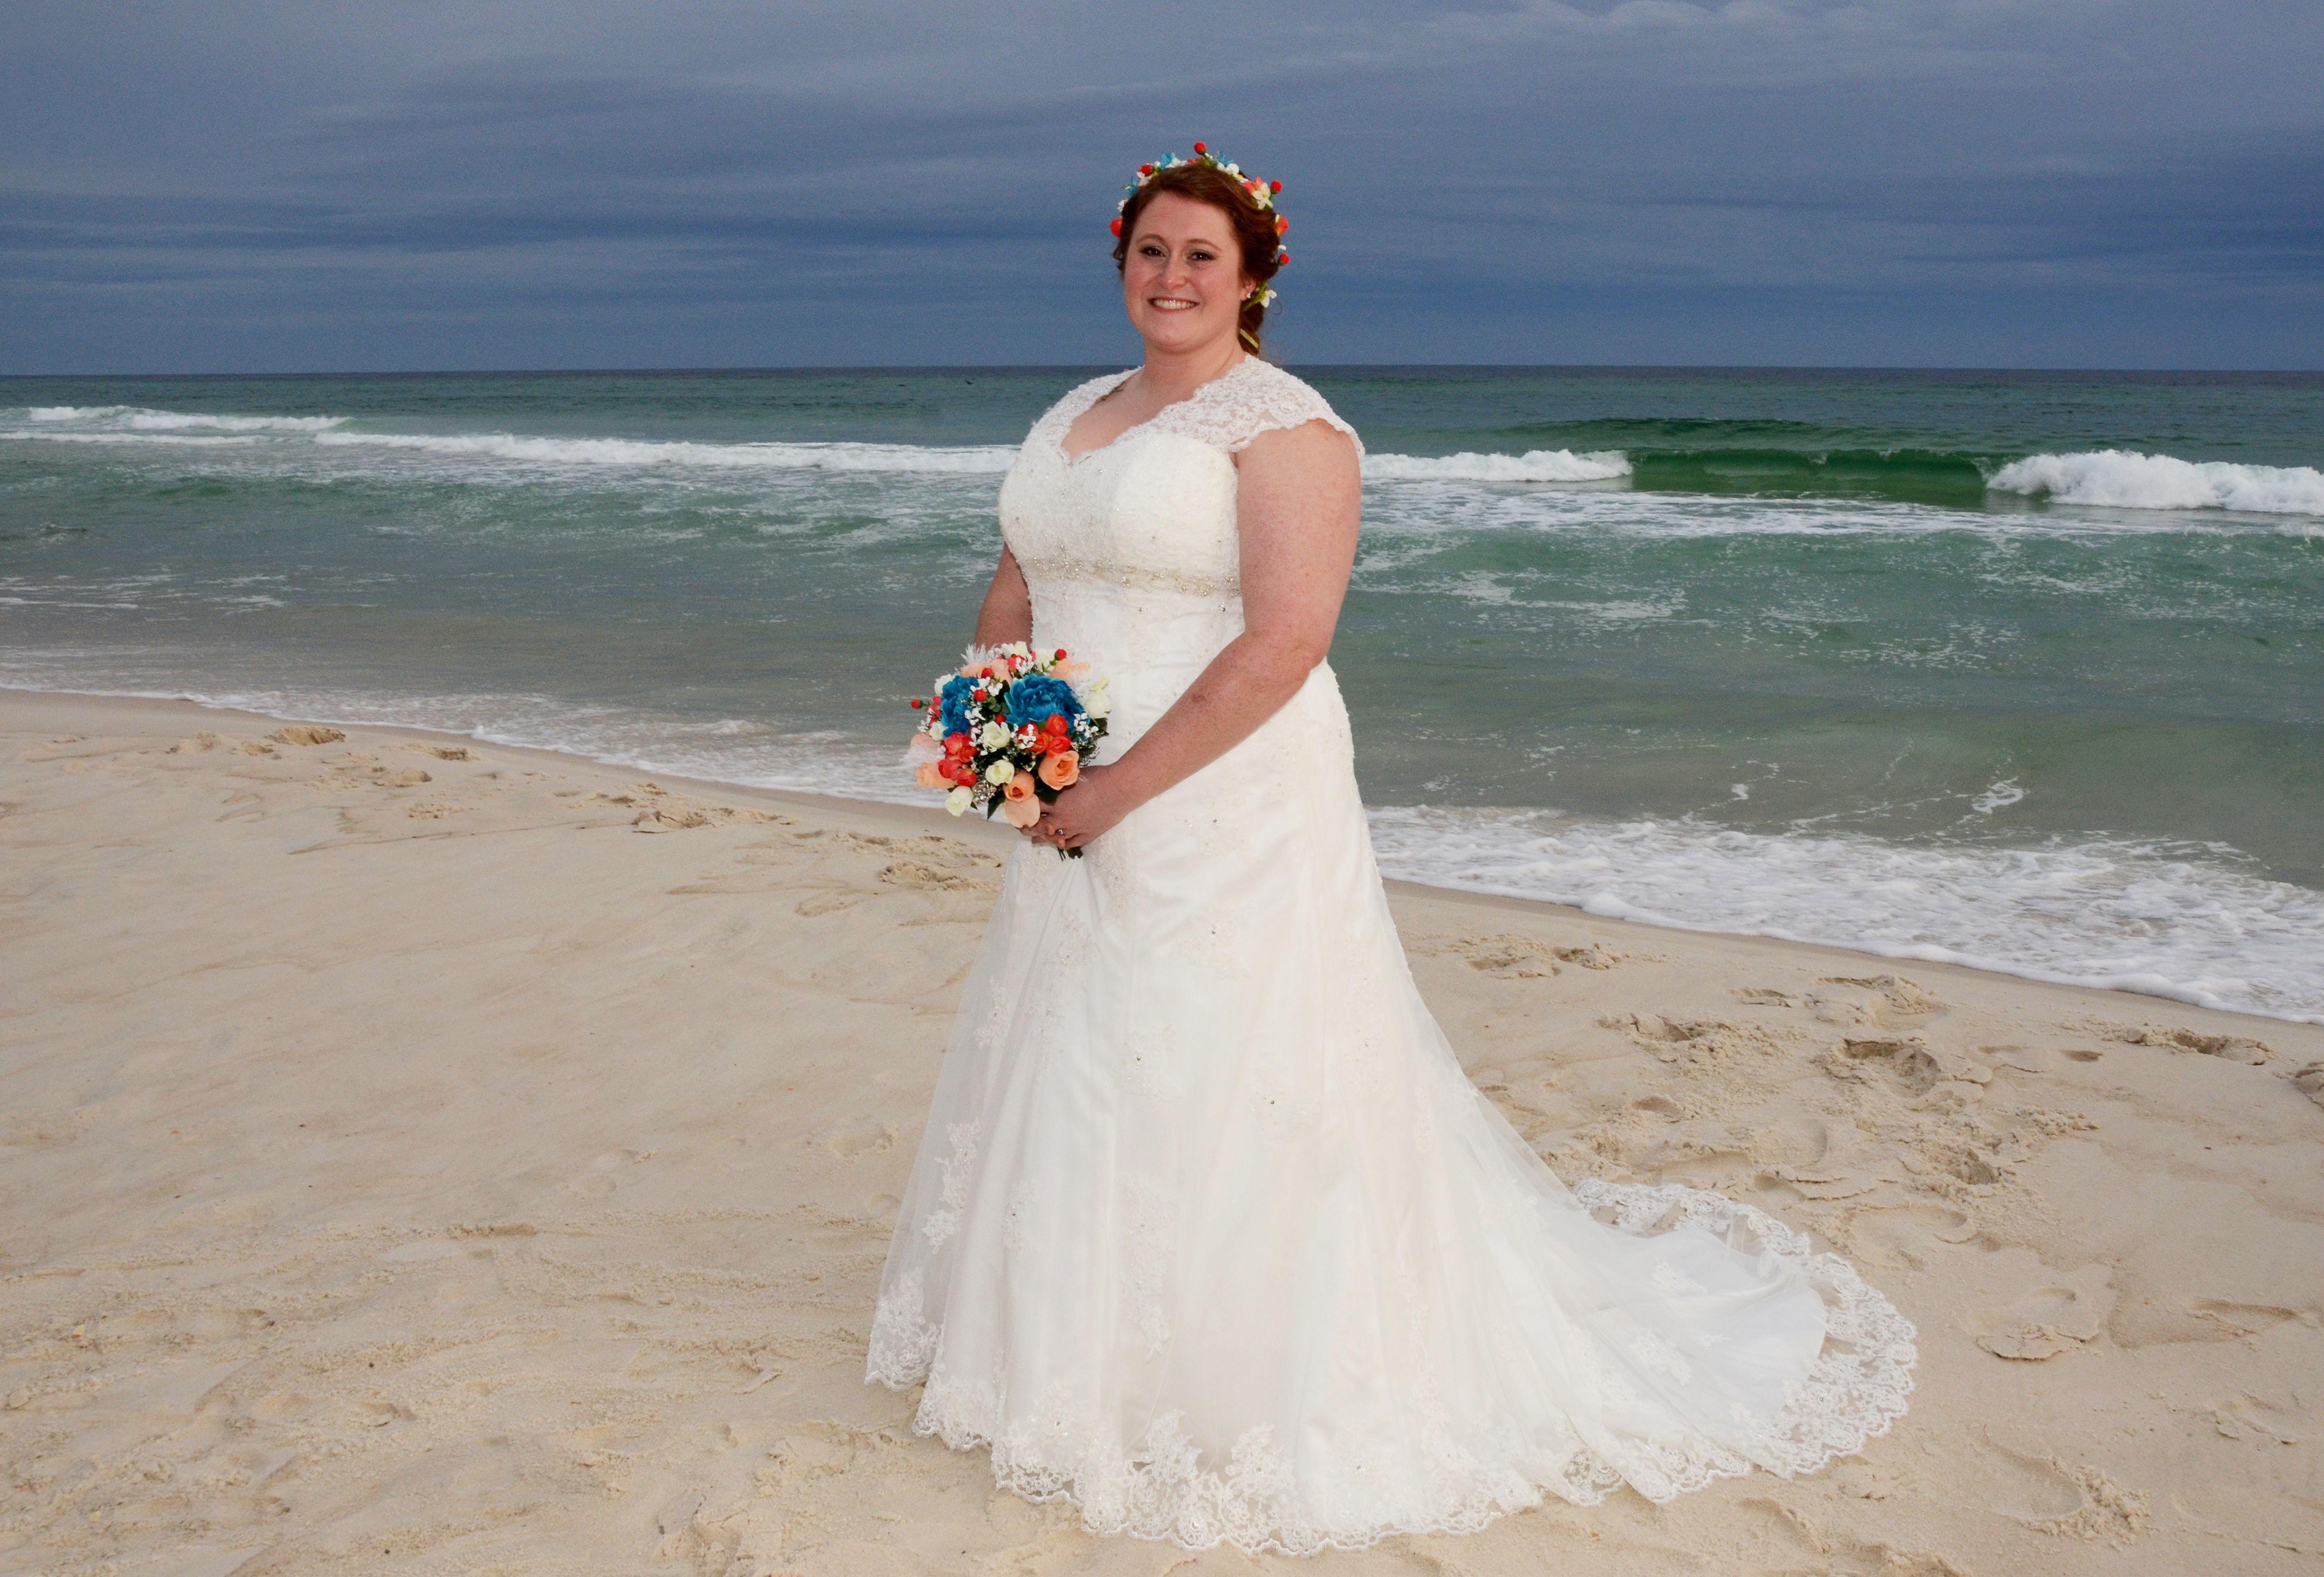 Panama City Beach, Florida destination beach bride! Photo